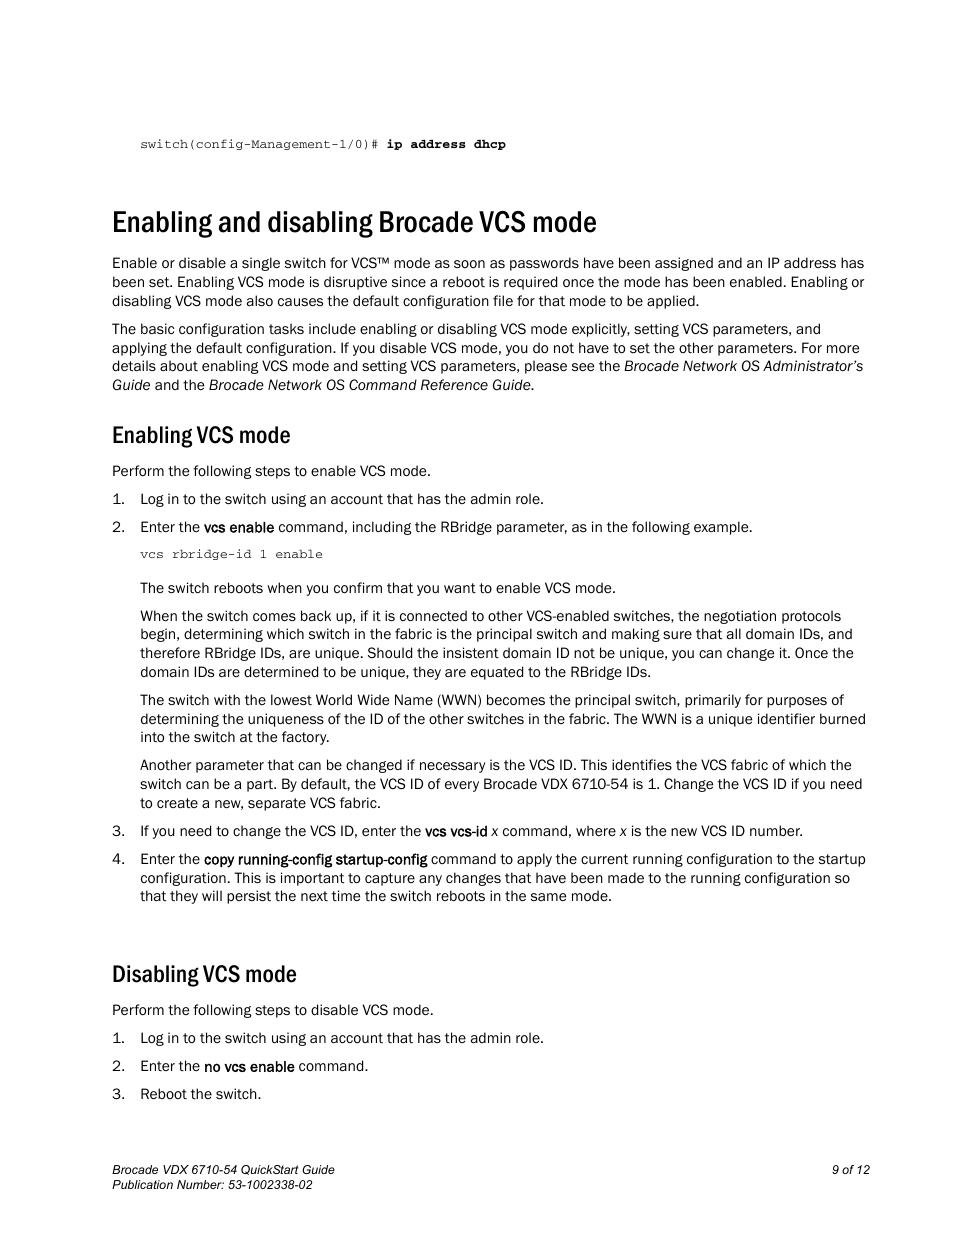 Enabling and disabling brocade vcs mode, Enabling vcs mode